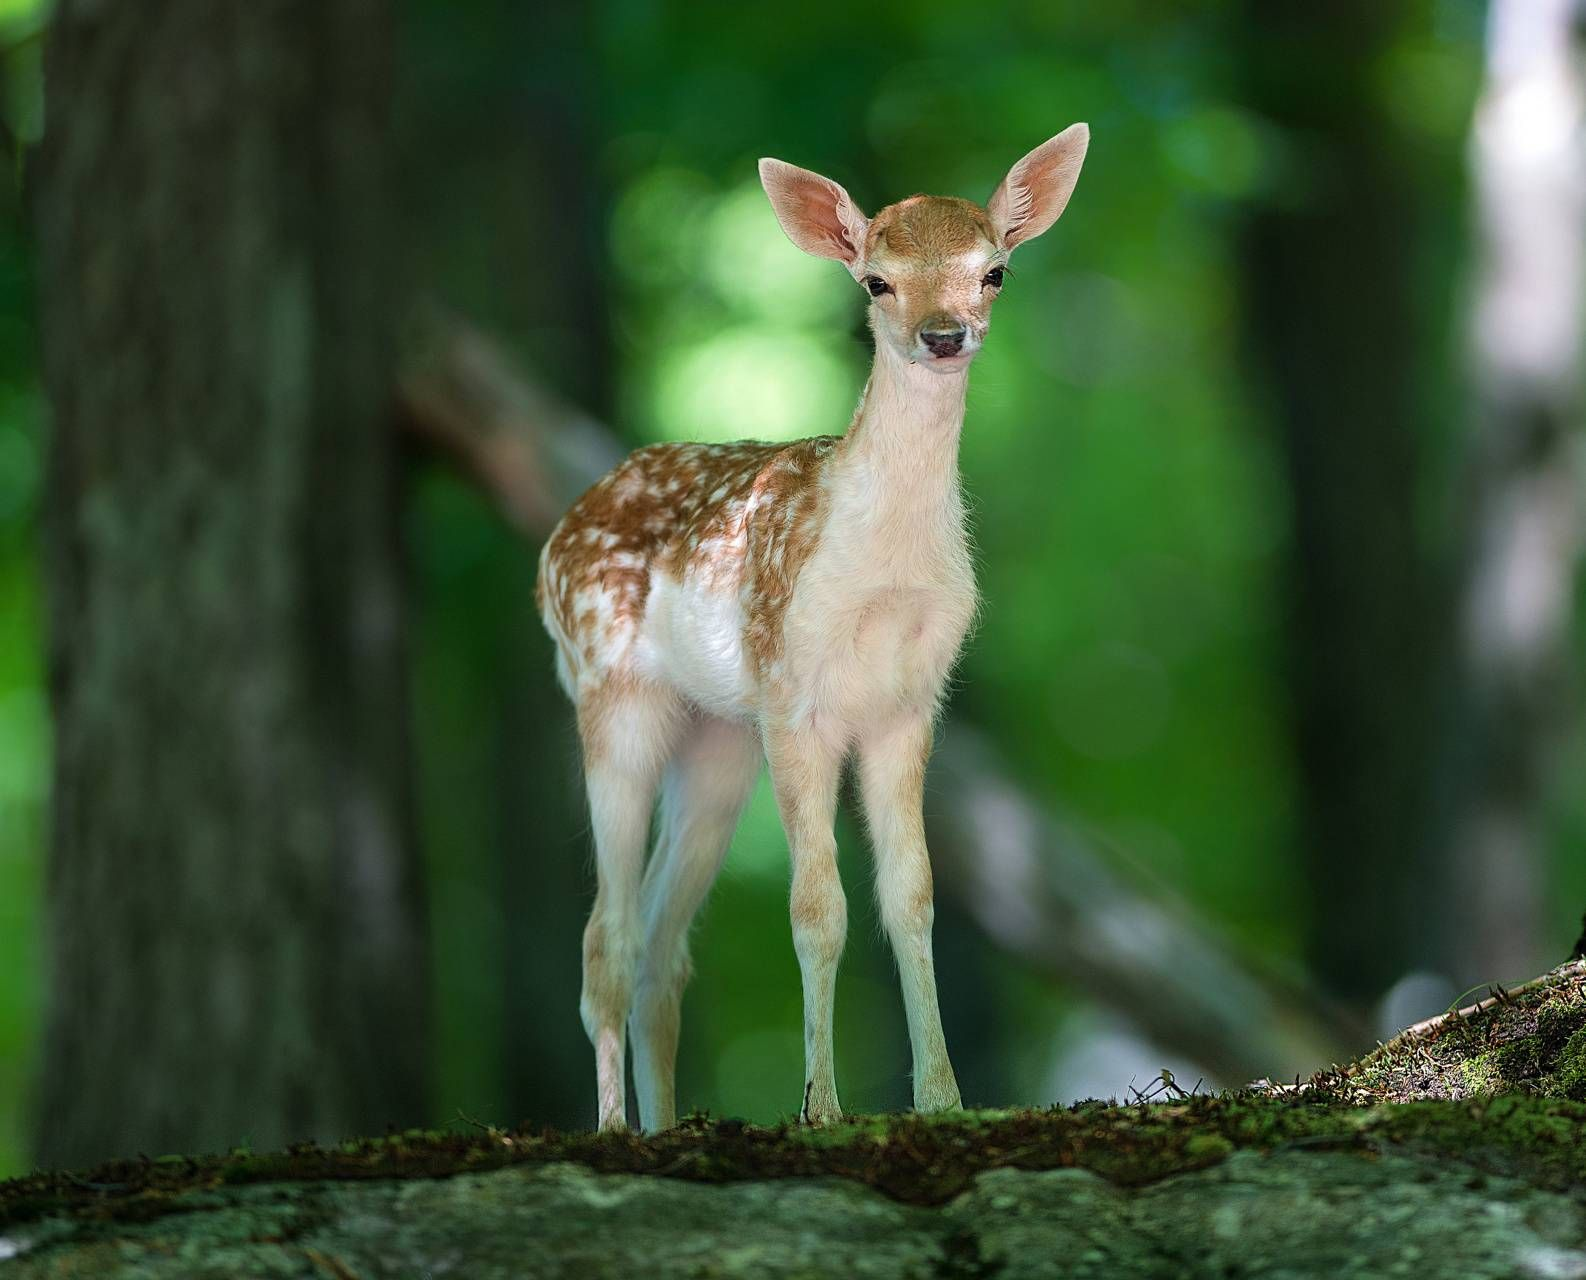 #nature #animal #pets #love #cute #animallovers #animallover #naturephotography #sweety #beauty